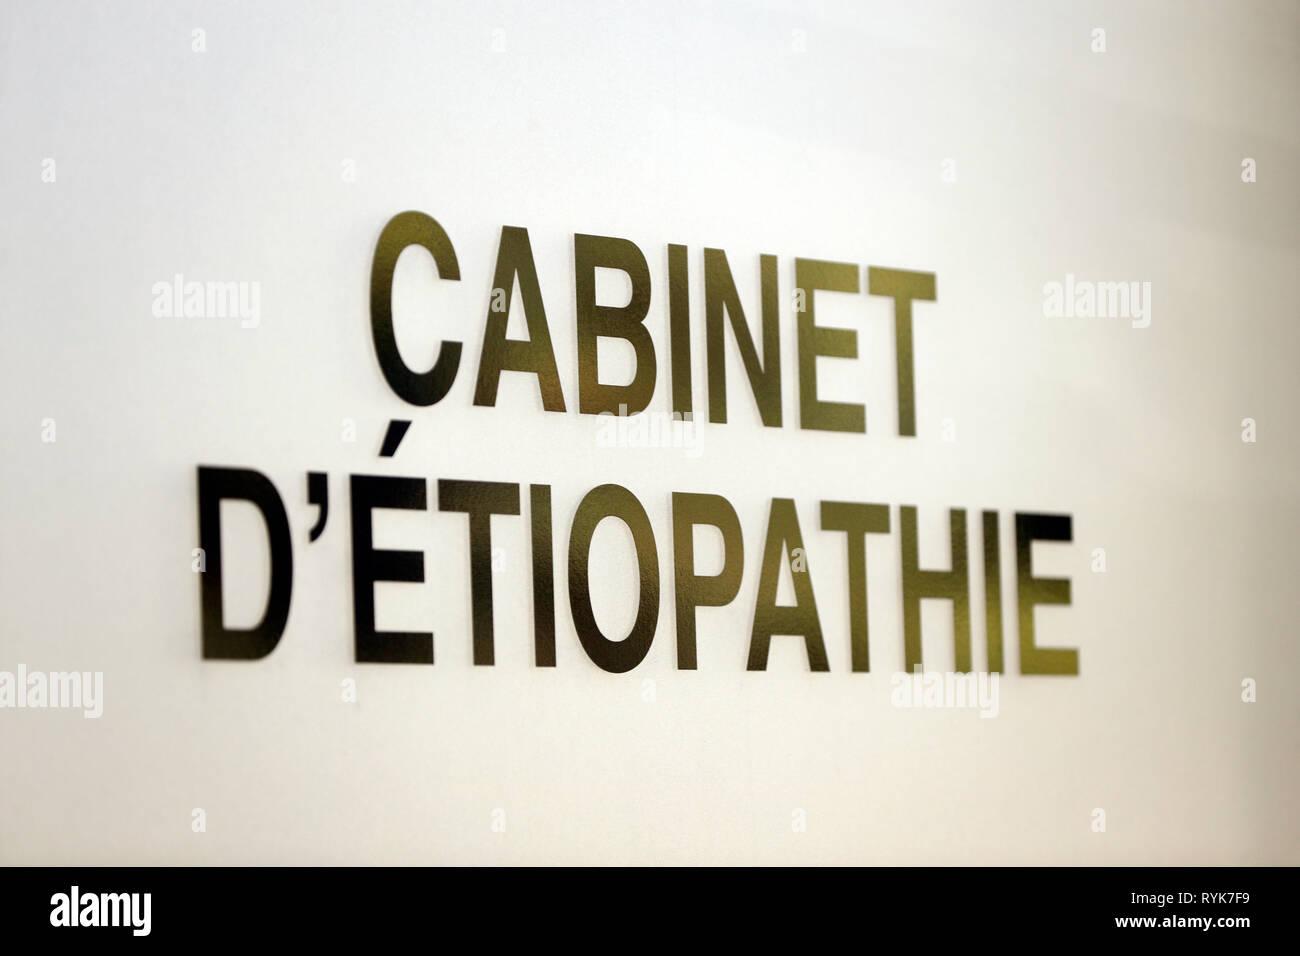 Etiopathy cabinet.  France. - Stock Image